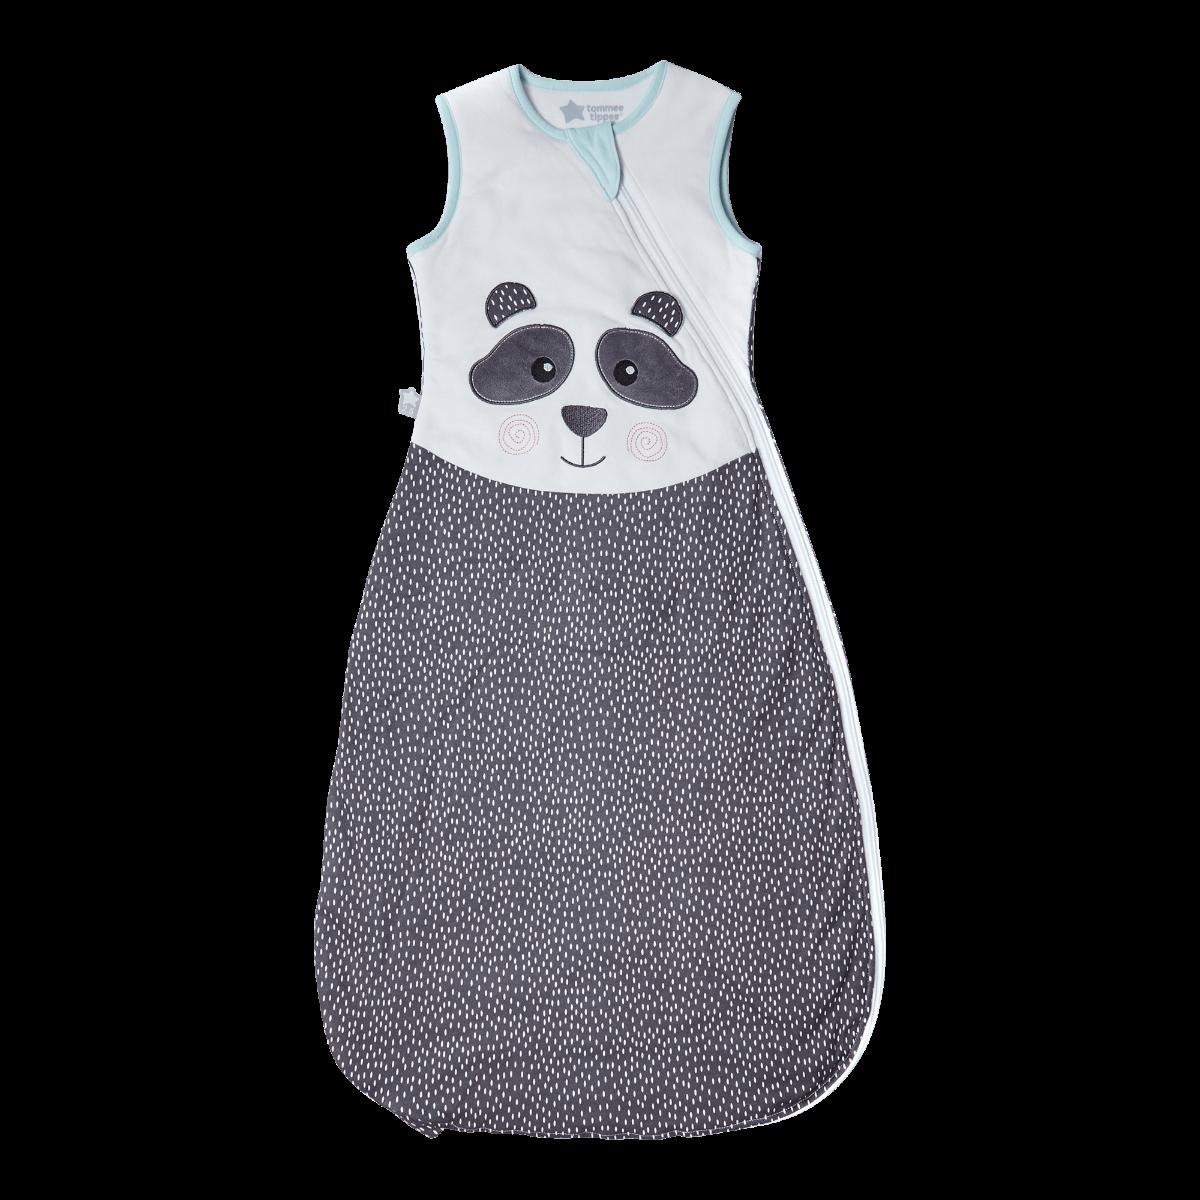 Spací pytel Grobag 18-36m letní Pip the Panda